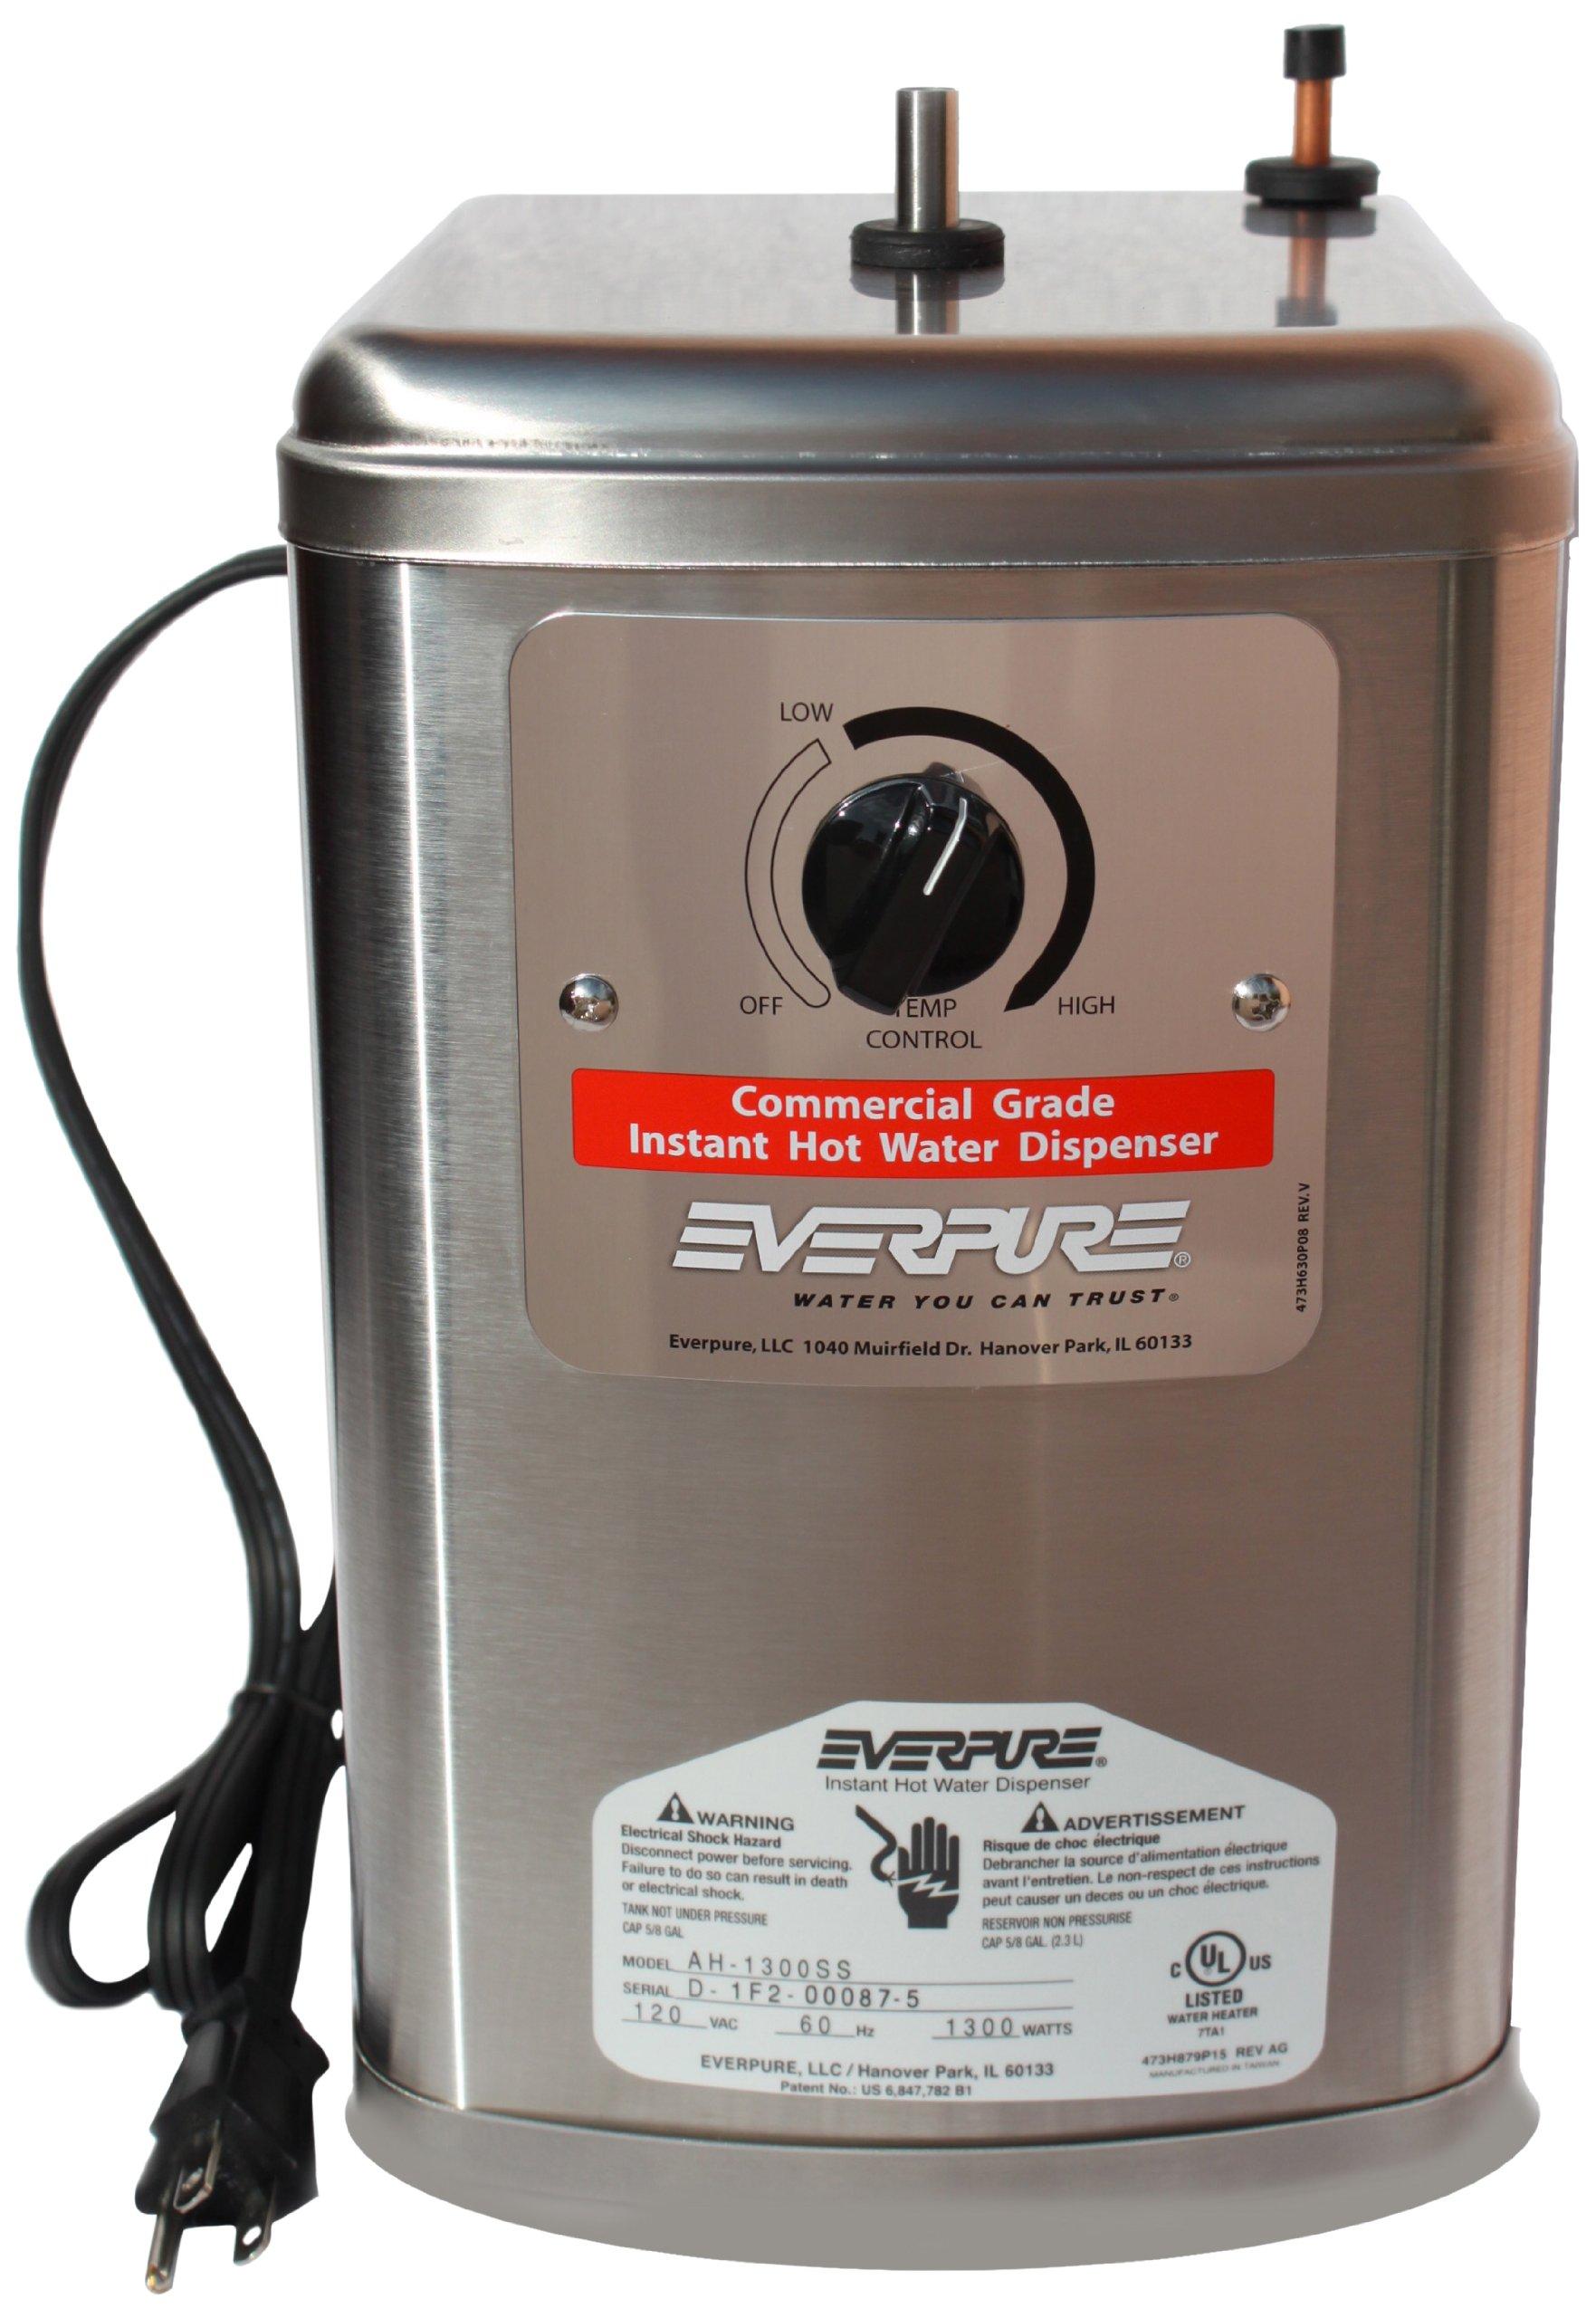 Everpure Solaria Instant Hot Water Dispenser (EV9318-40) by Everpure